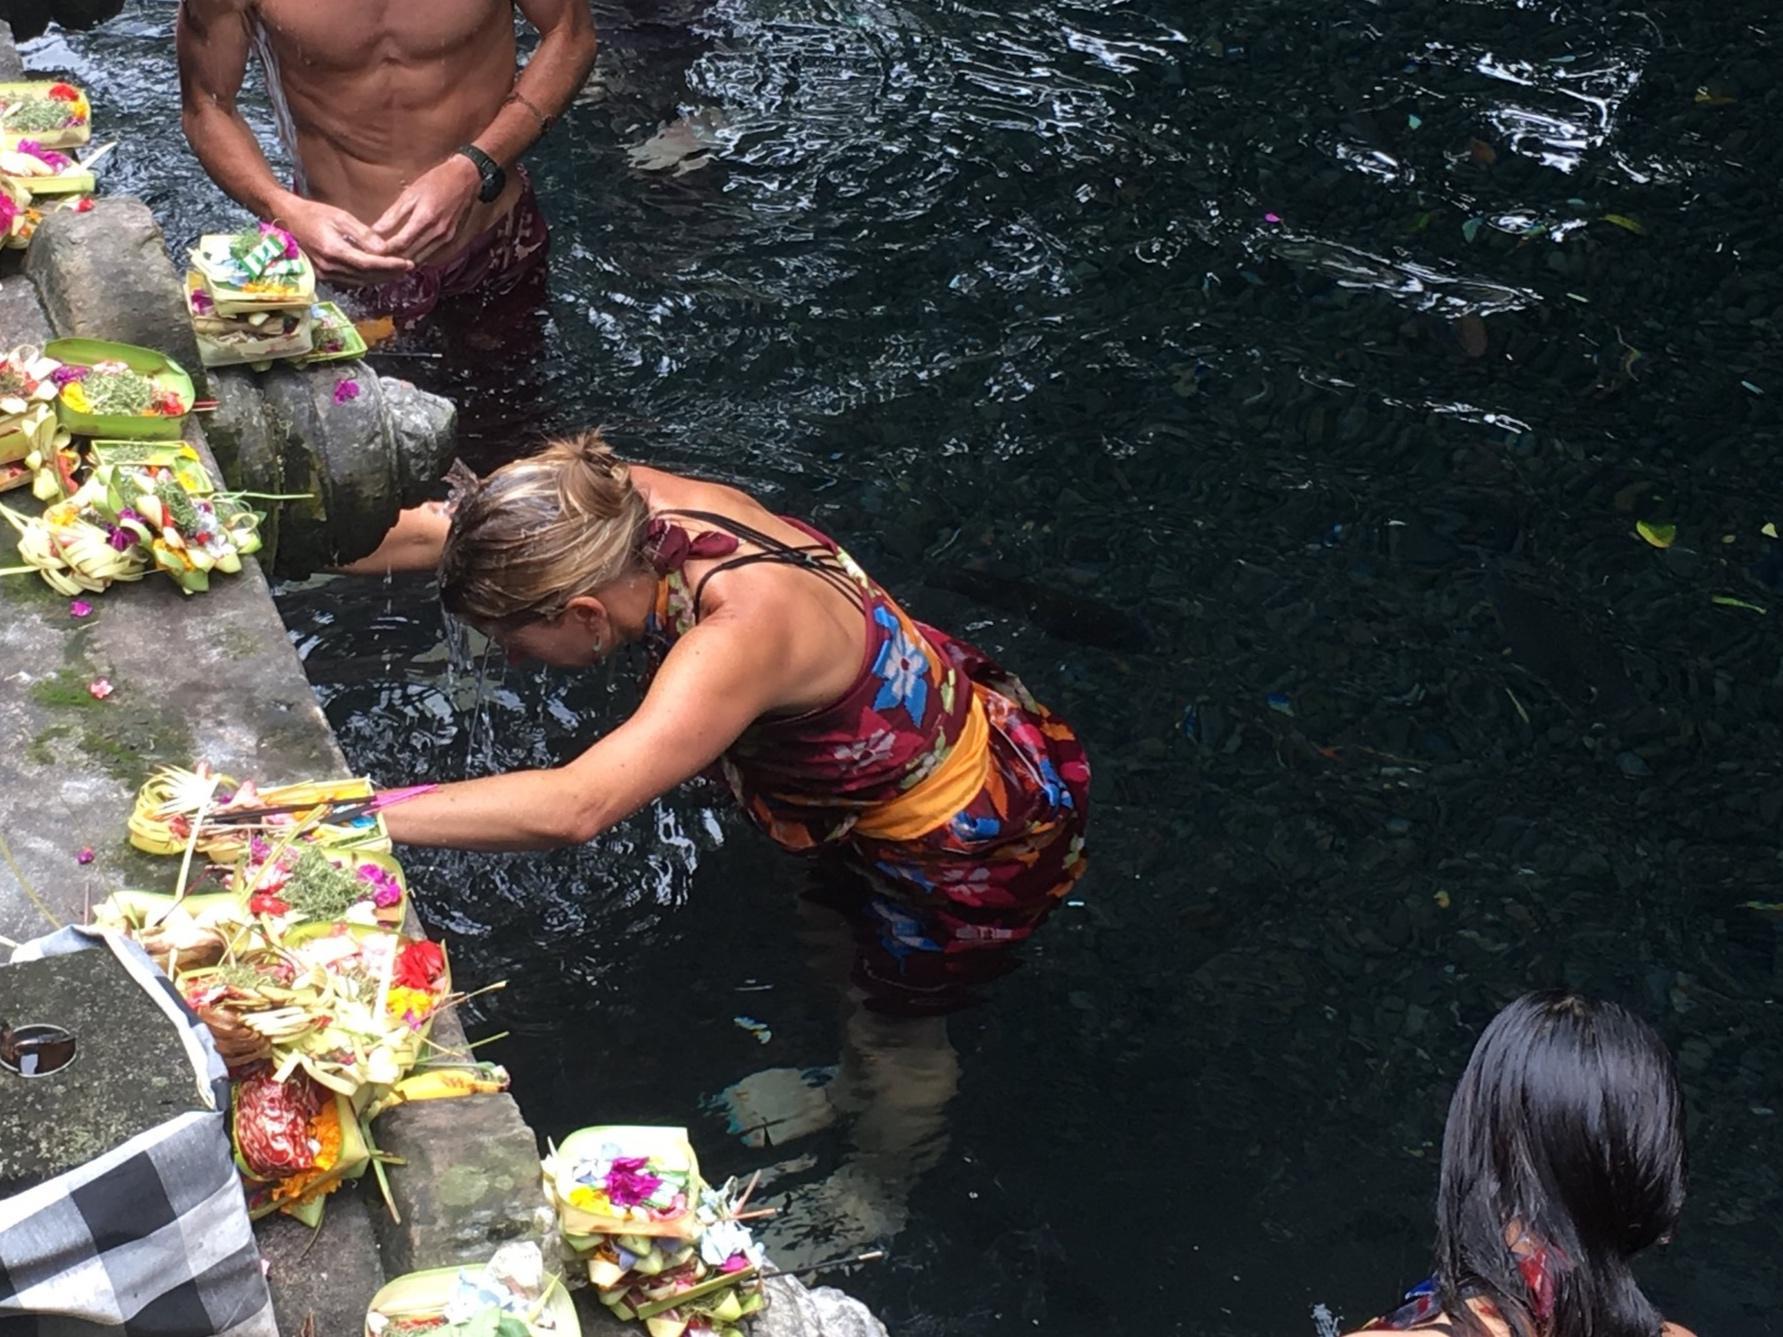 Tirta Empul Temple- Water Cleansing Ritual in Bali